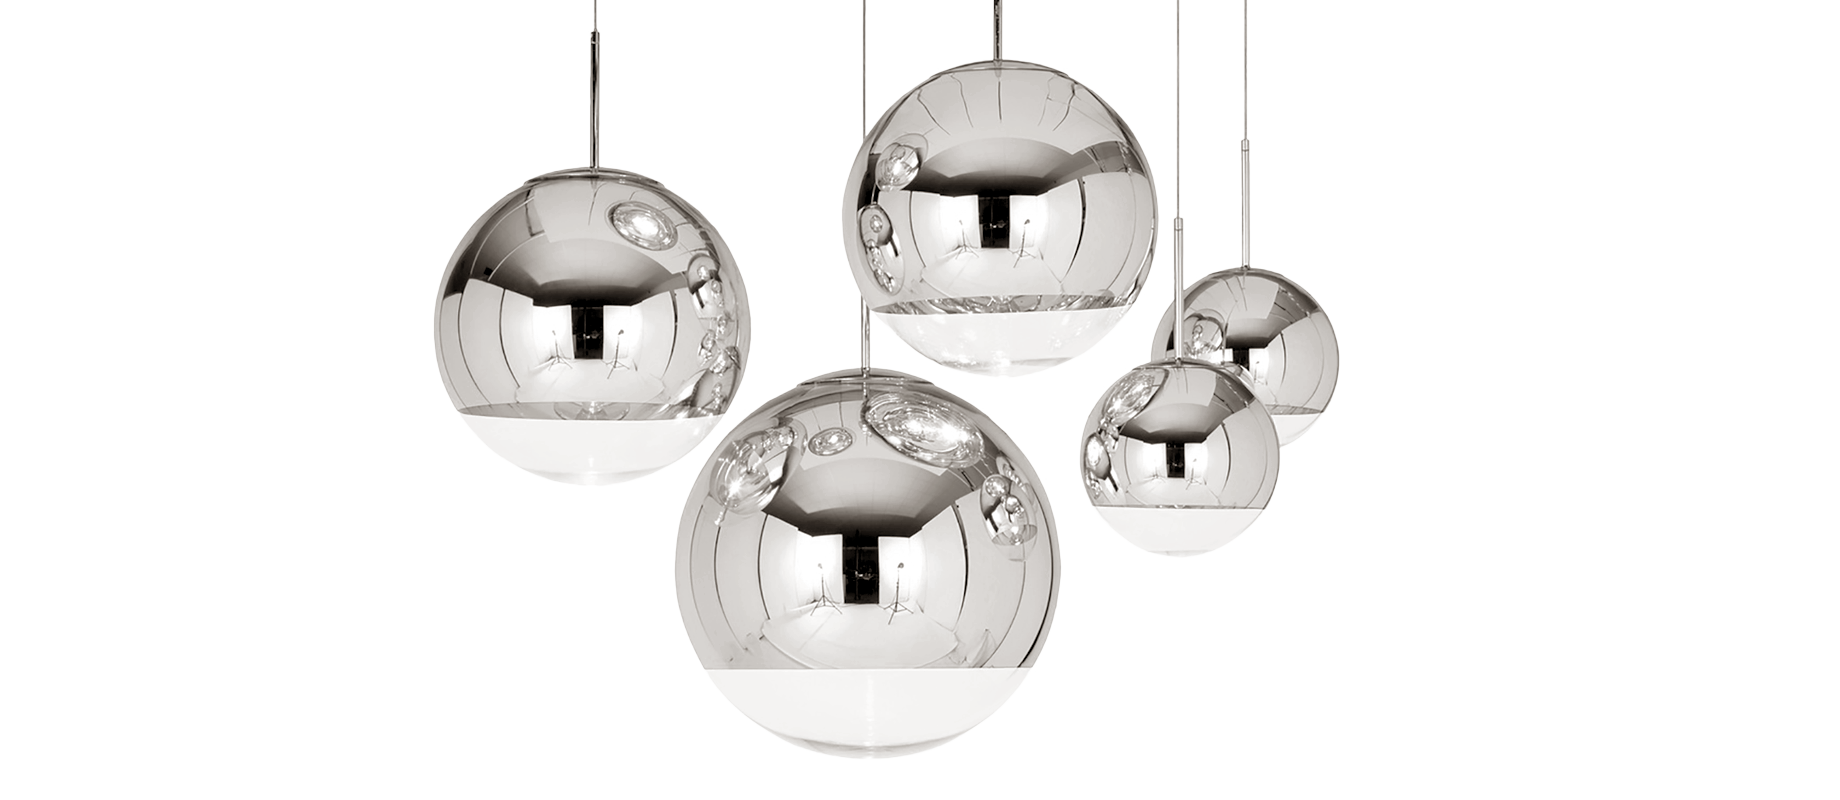 Mirror Ball Takpendel | Olsson & Gerthel